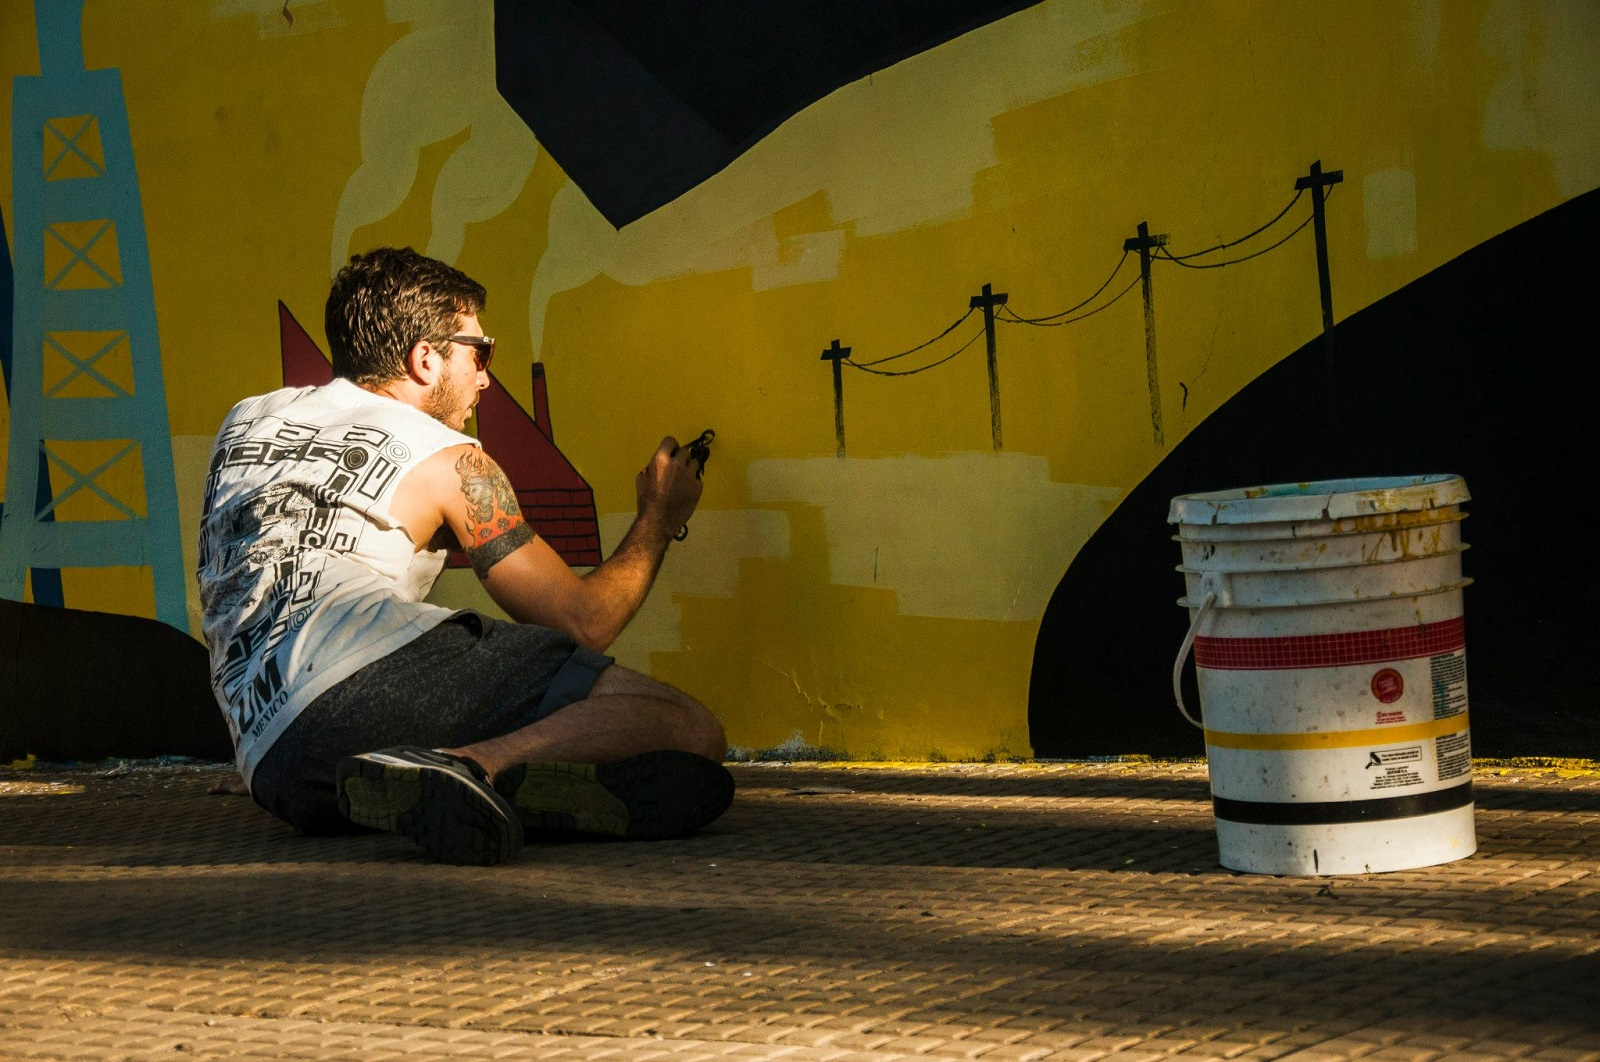 pedro-perelman-new-mural-for-oficio-residence-06